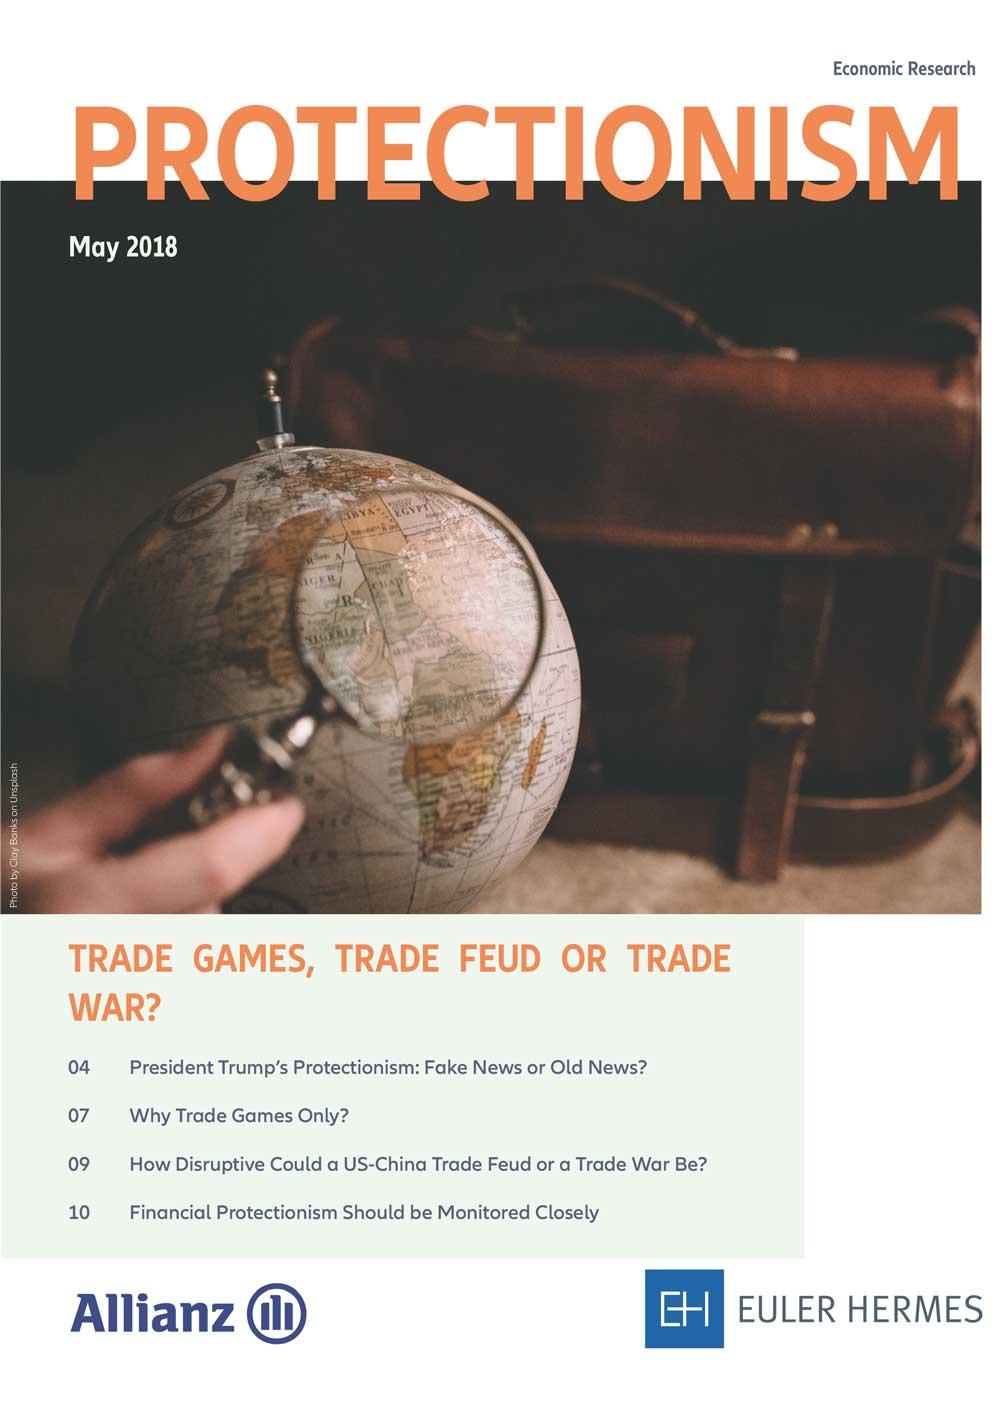 Trade games, trade feud or trade war?